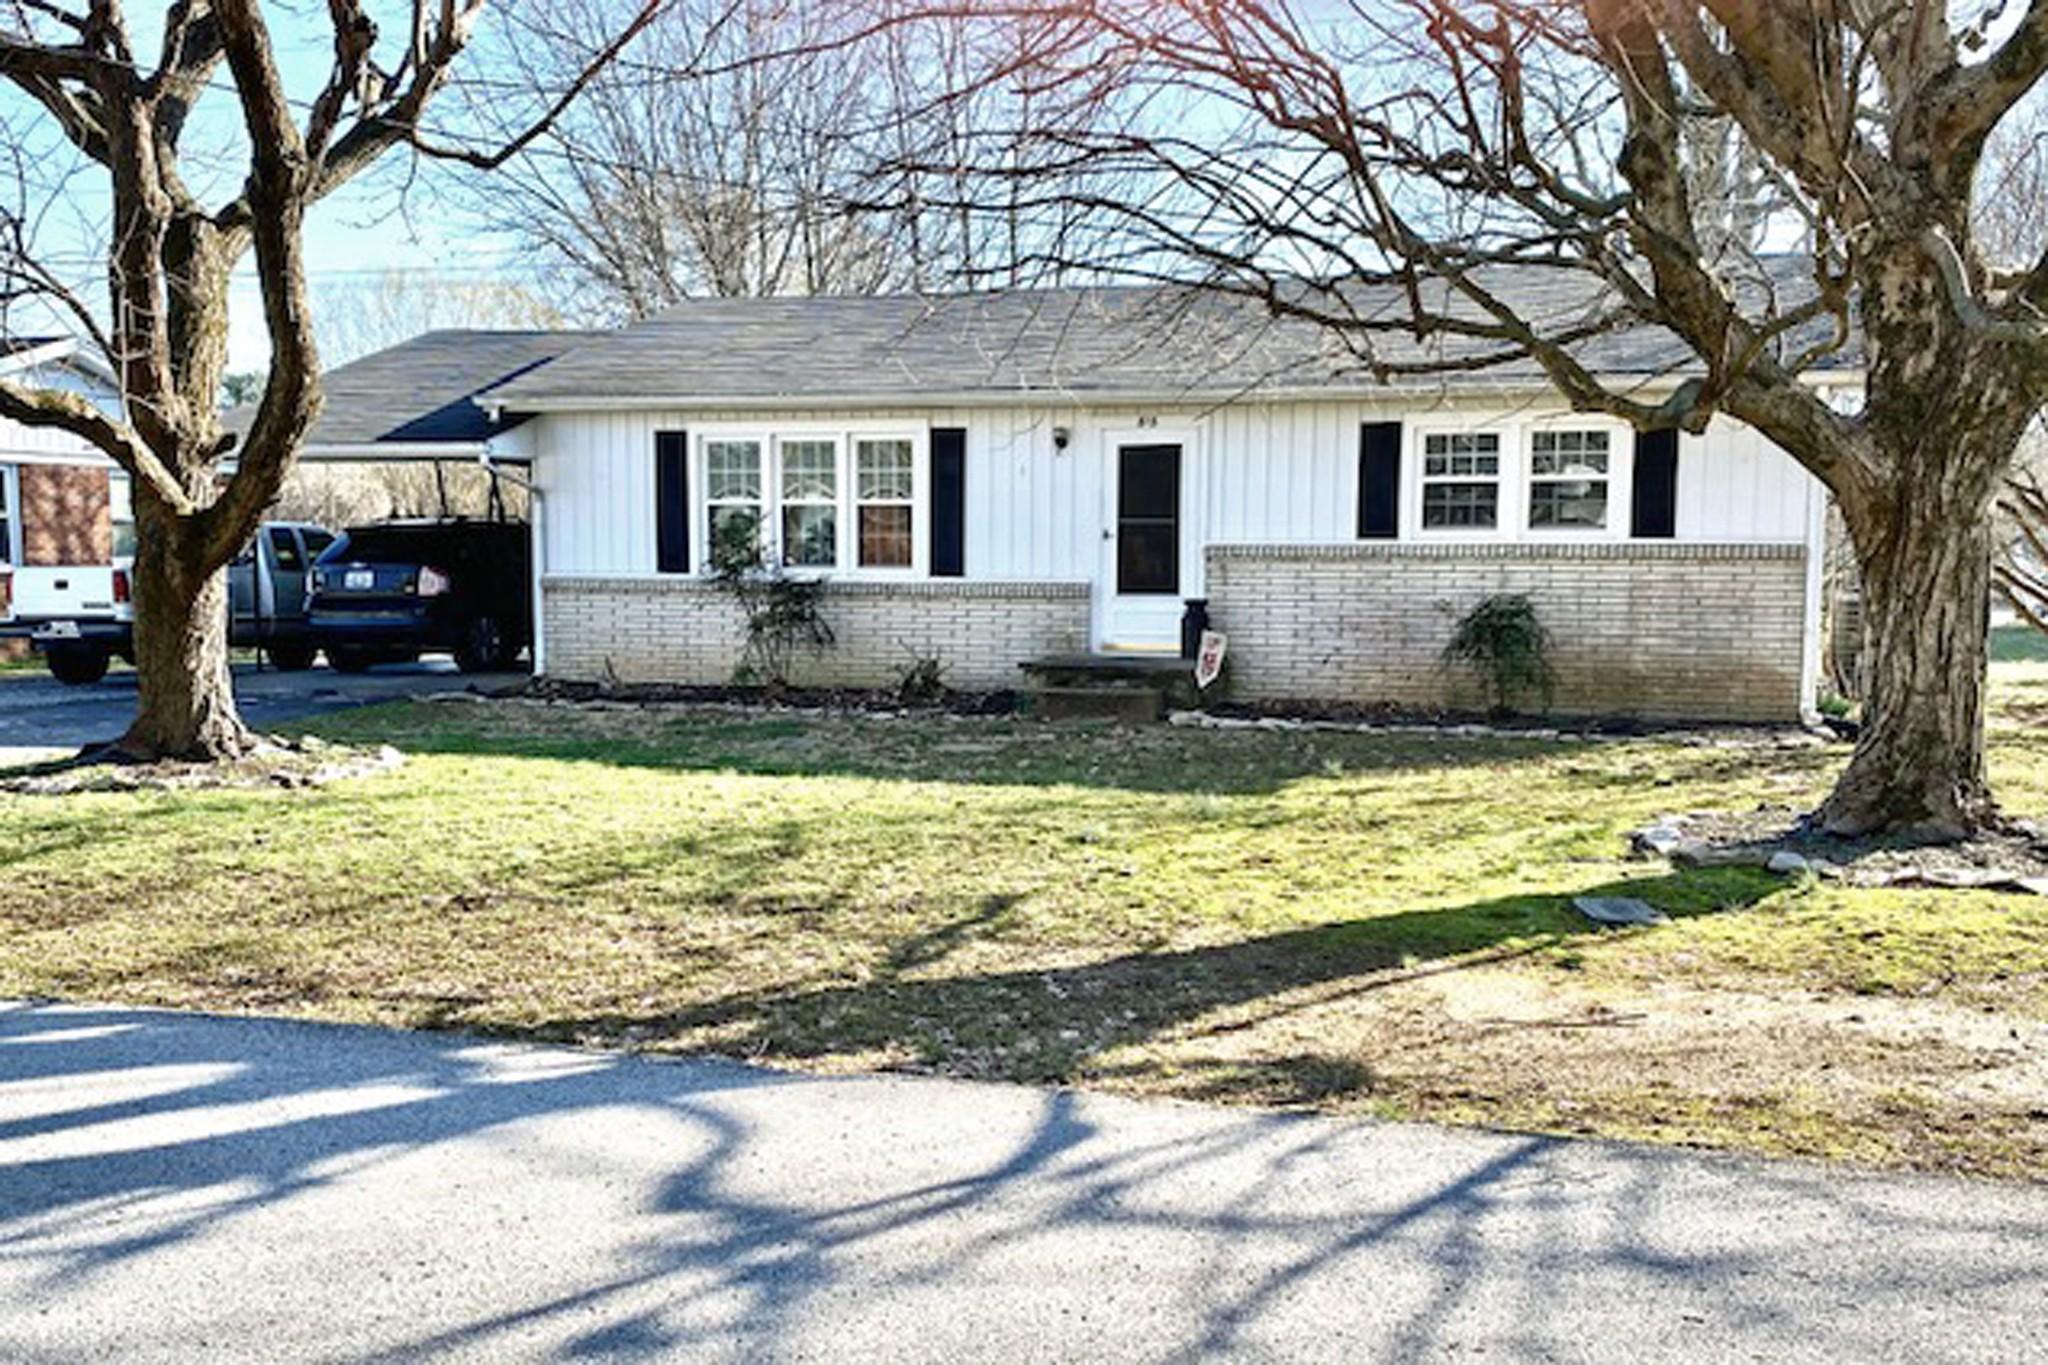 818 Spears Ave, Franklin, KY 42134 - Franklin, KY real estate listing